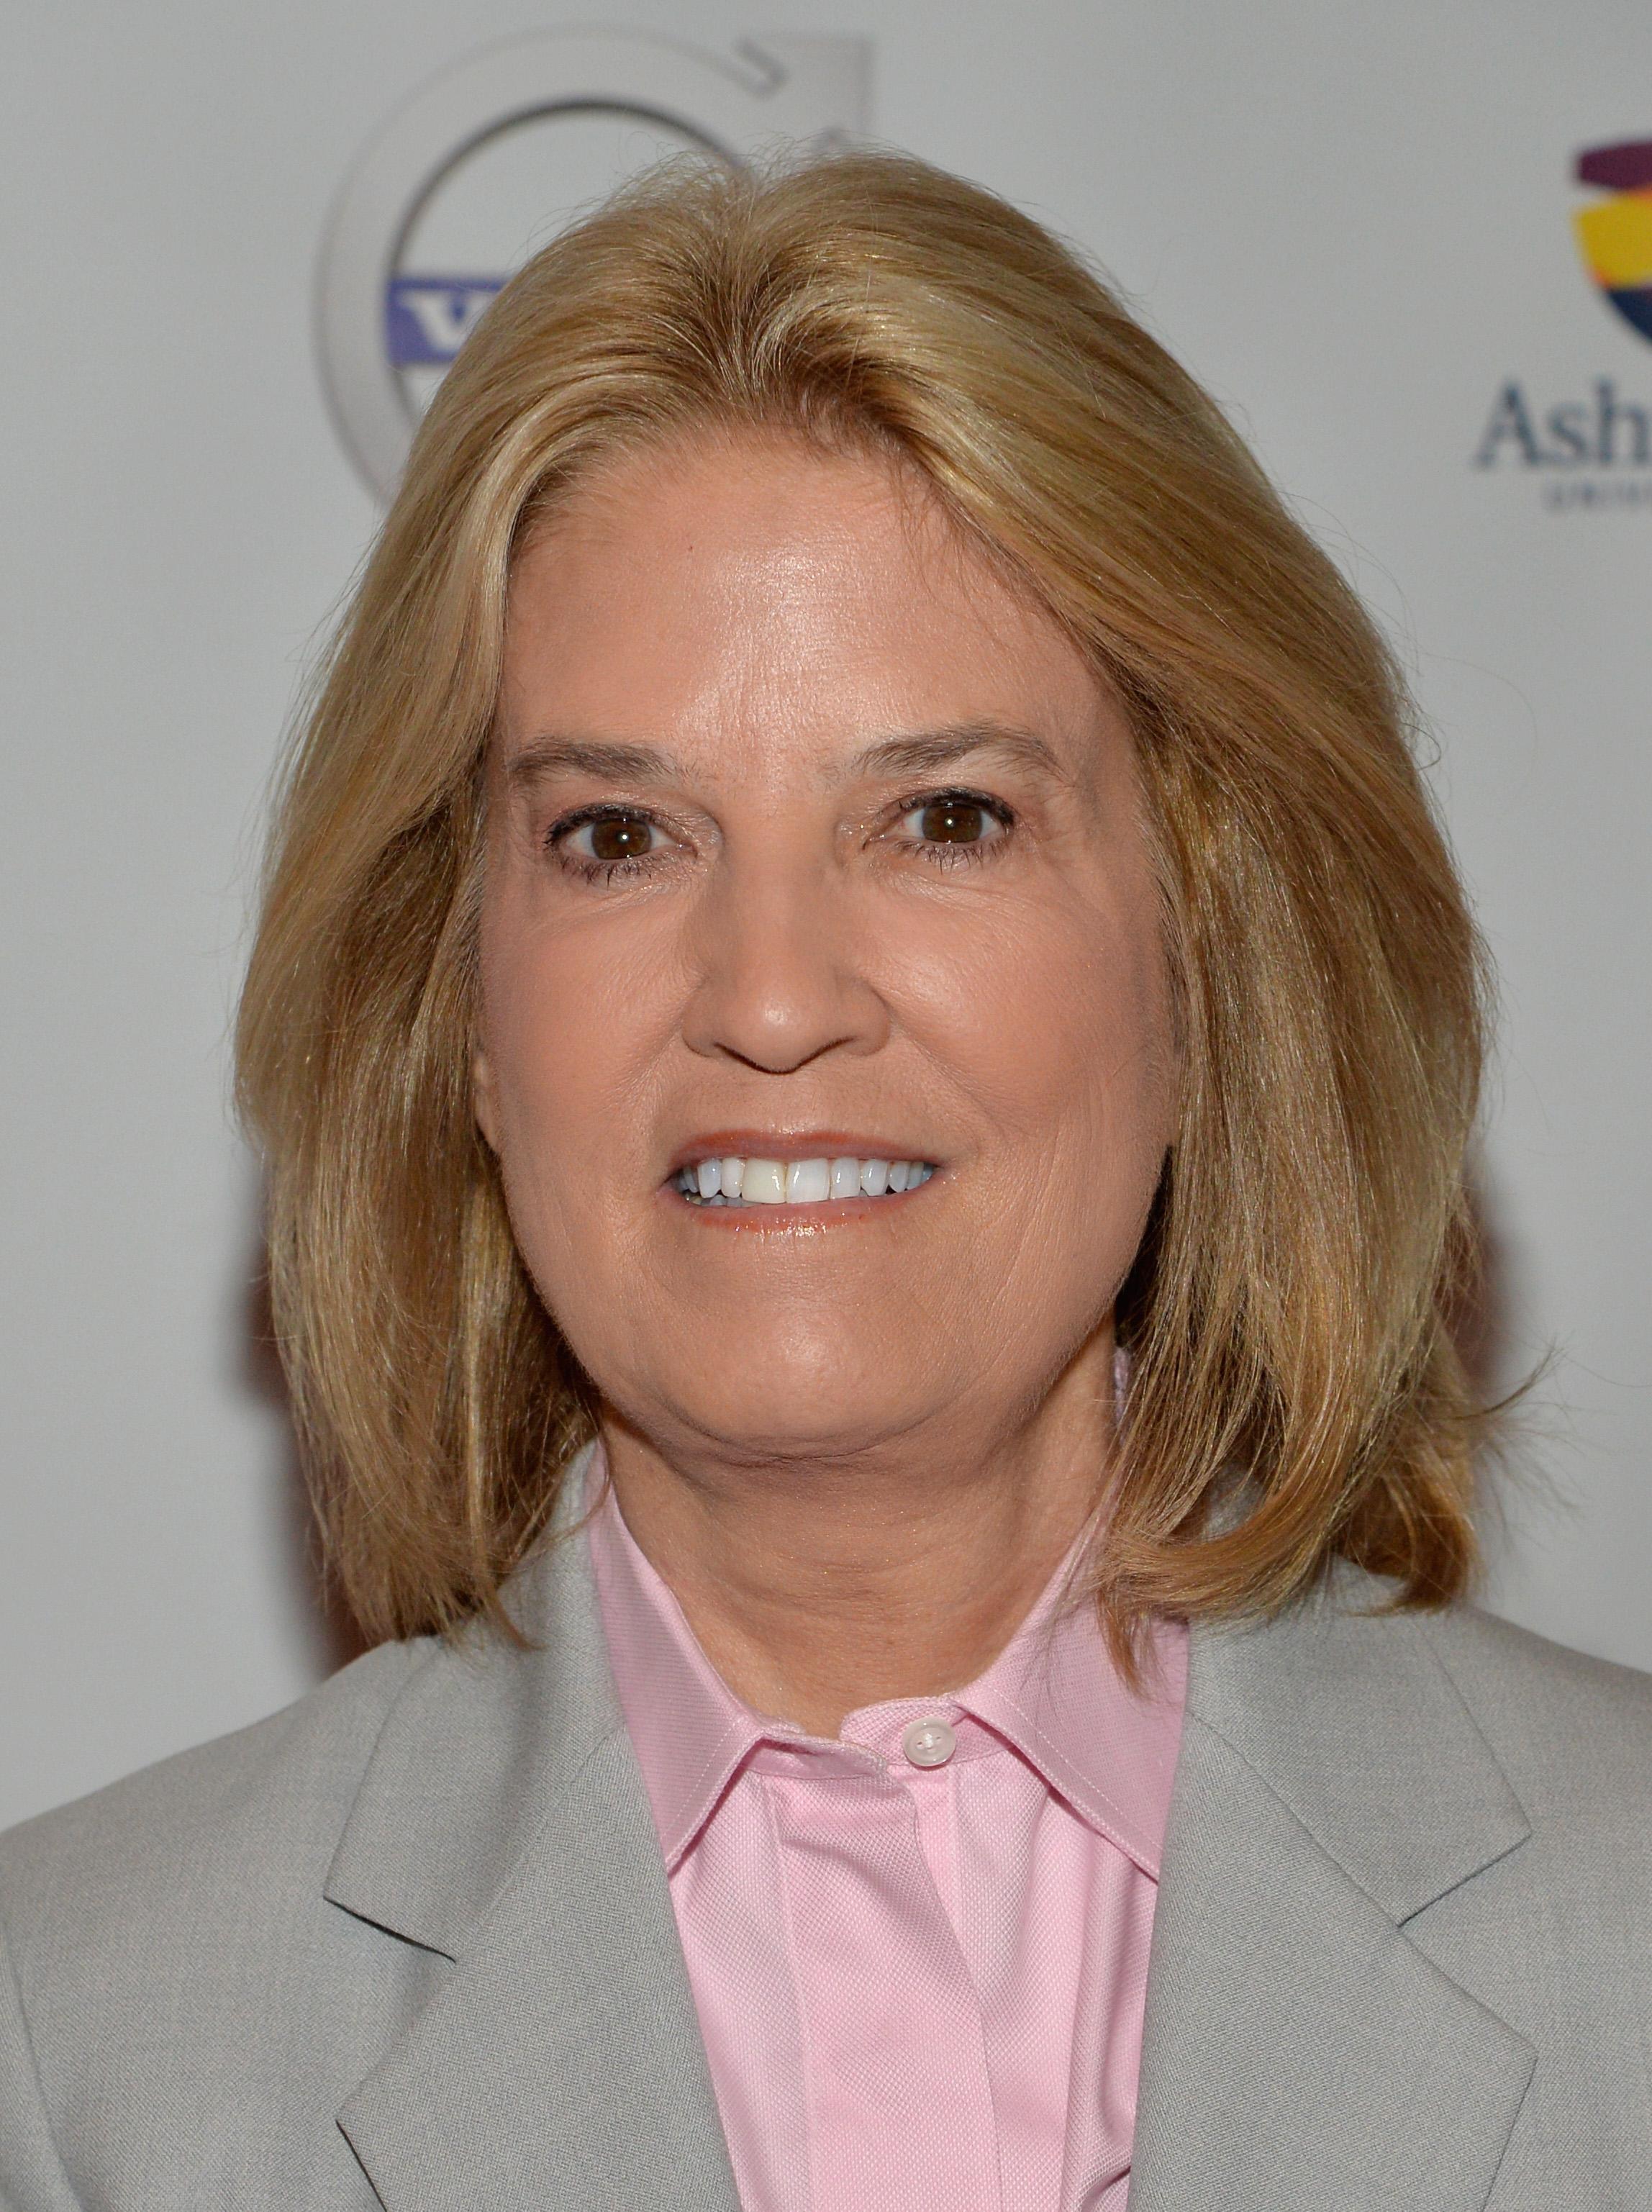 2016 Forbes Women's Summit